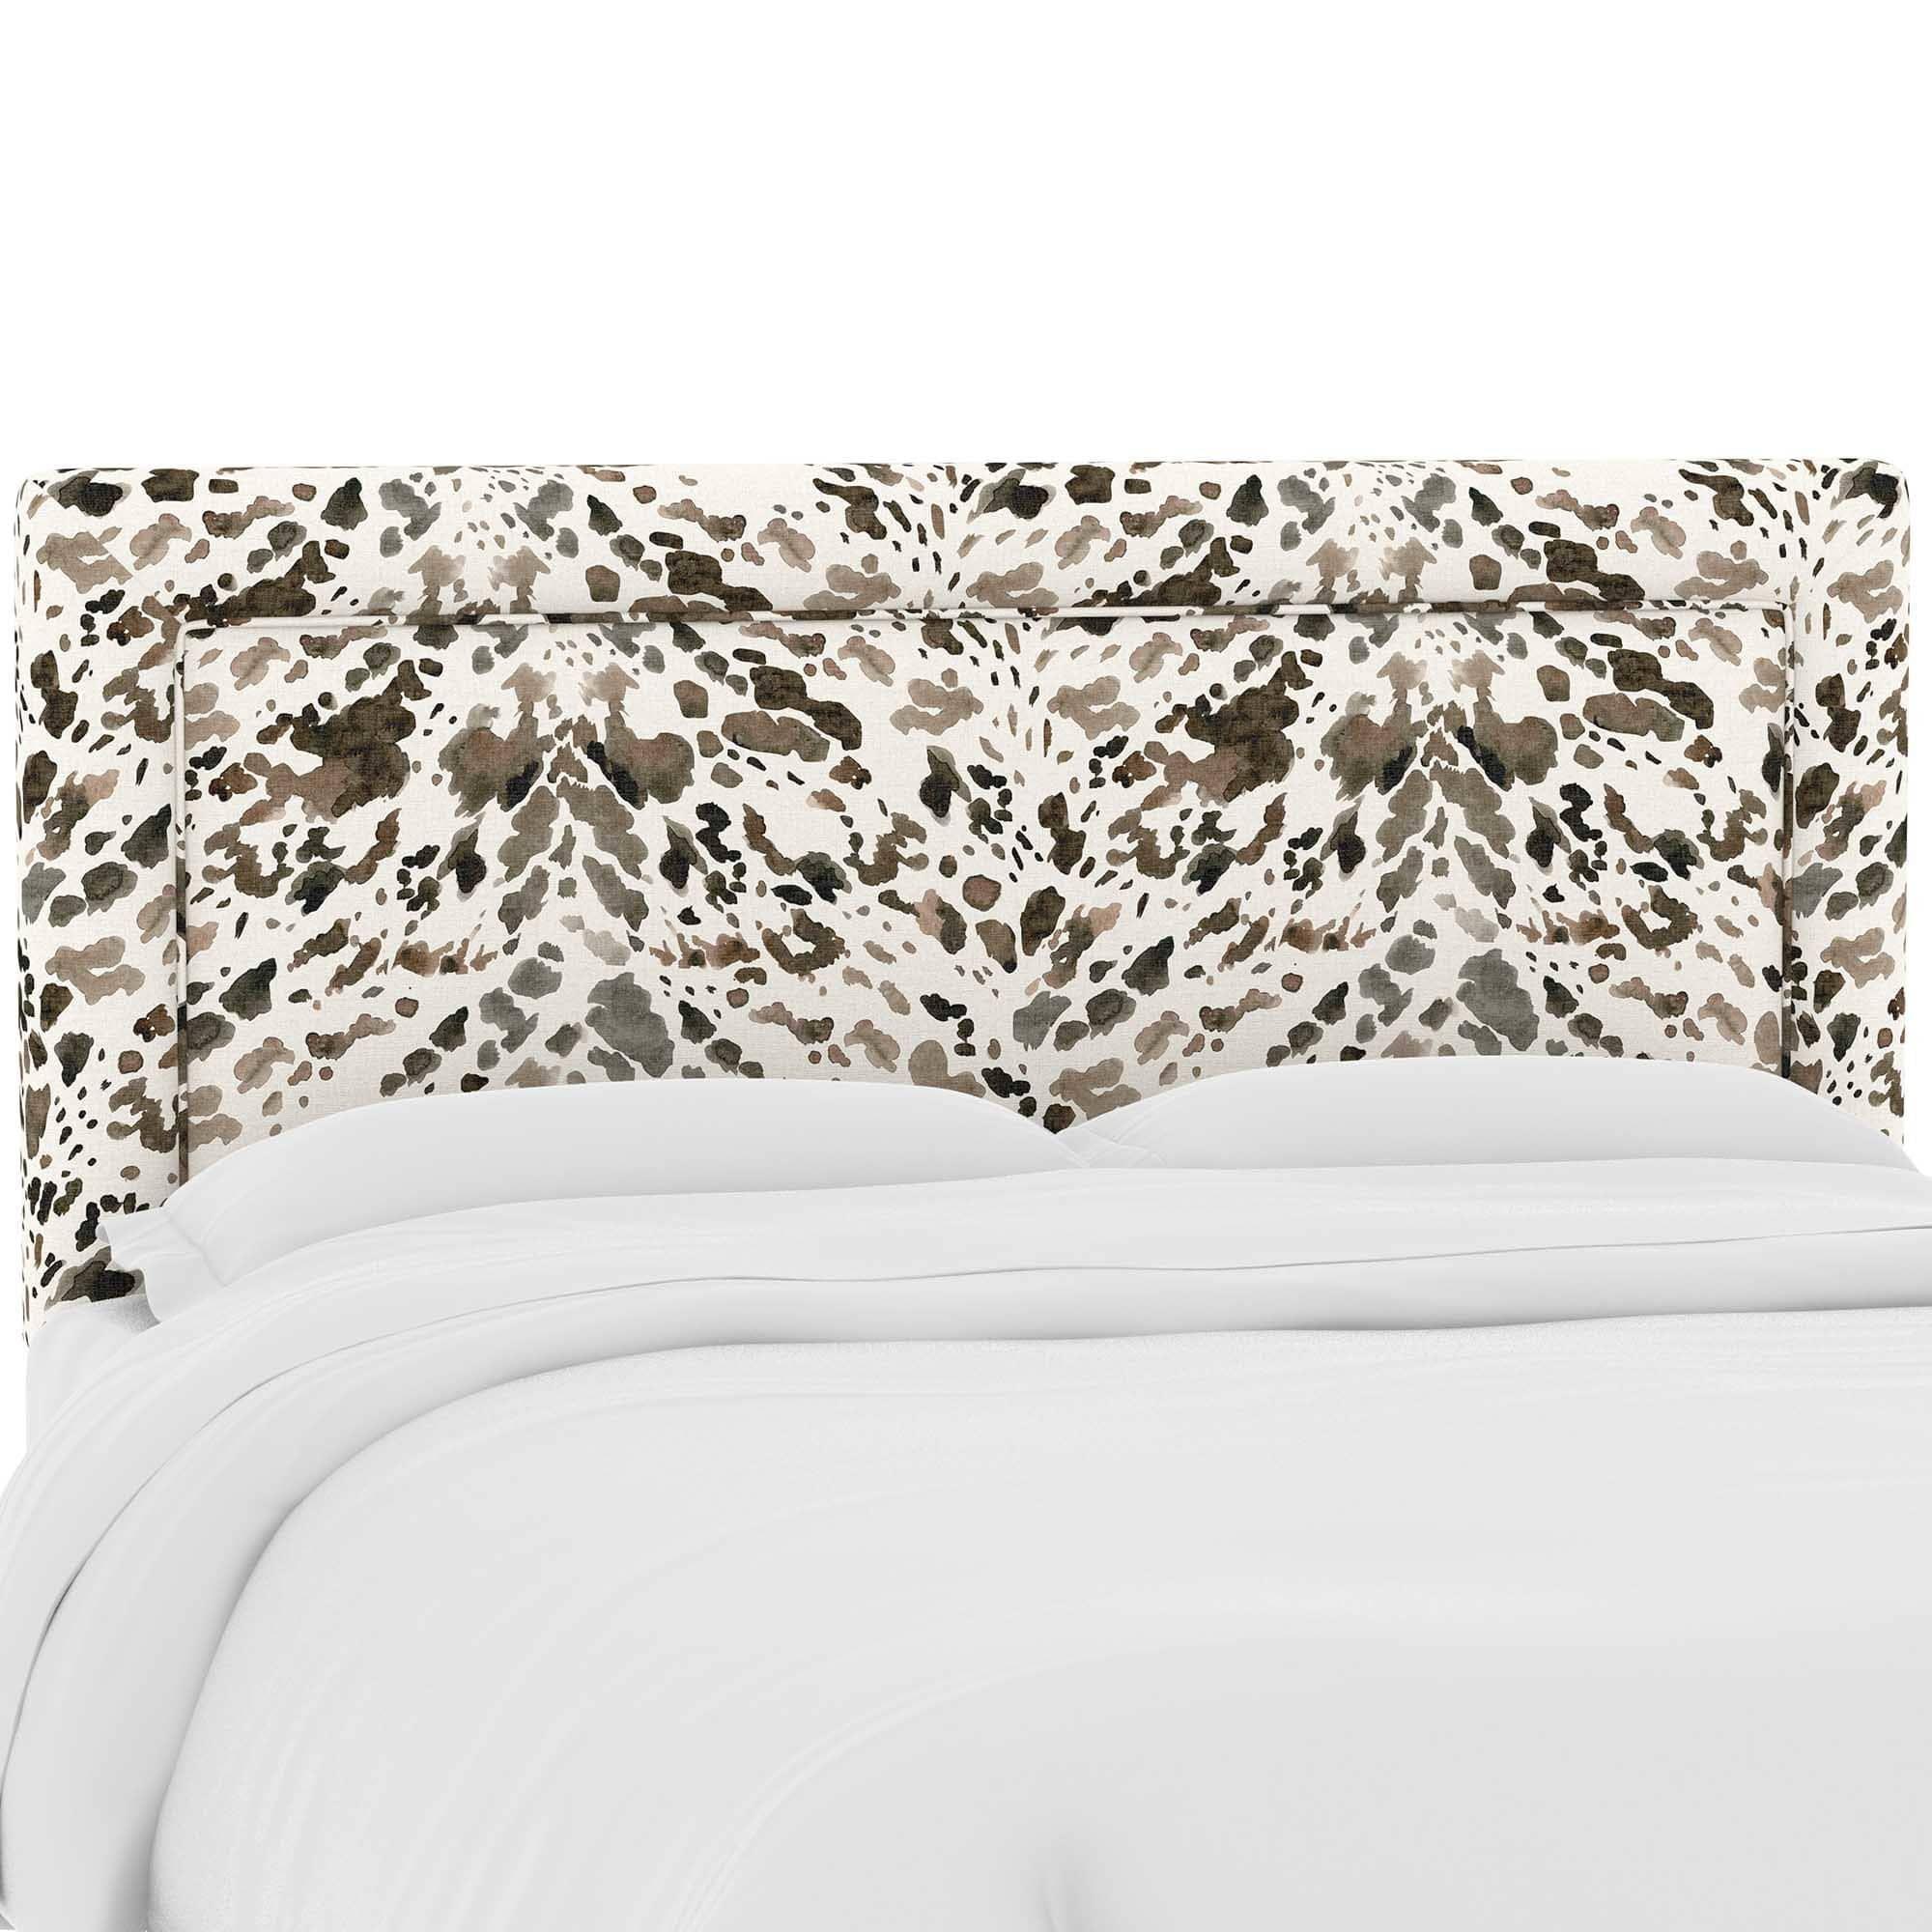 skyline furniture custom upholstered headboard in prints